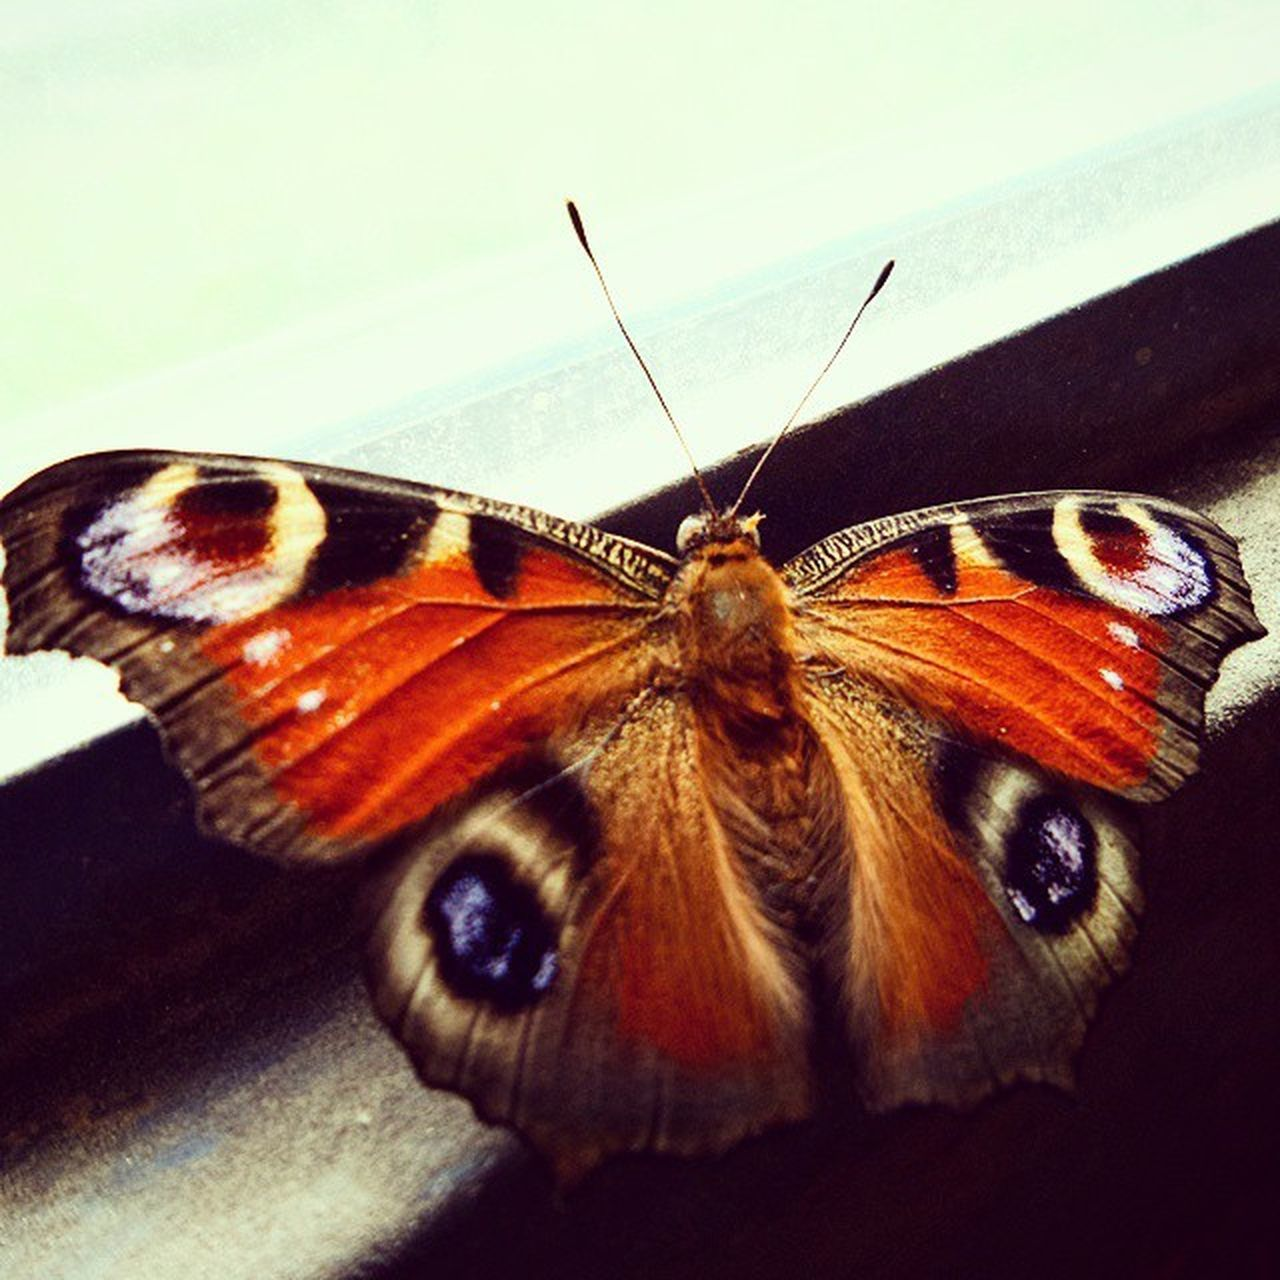 Hungary Hungarian Mik Ikozosseg Insta_hu Ig_hun Ptk Ptk_buginsects Bug Butterfly Macro Like Naturelovers Nature Colorful